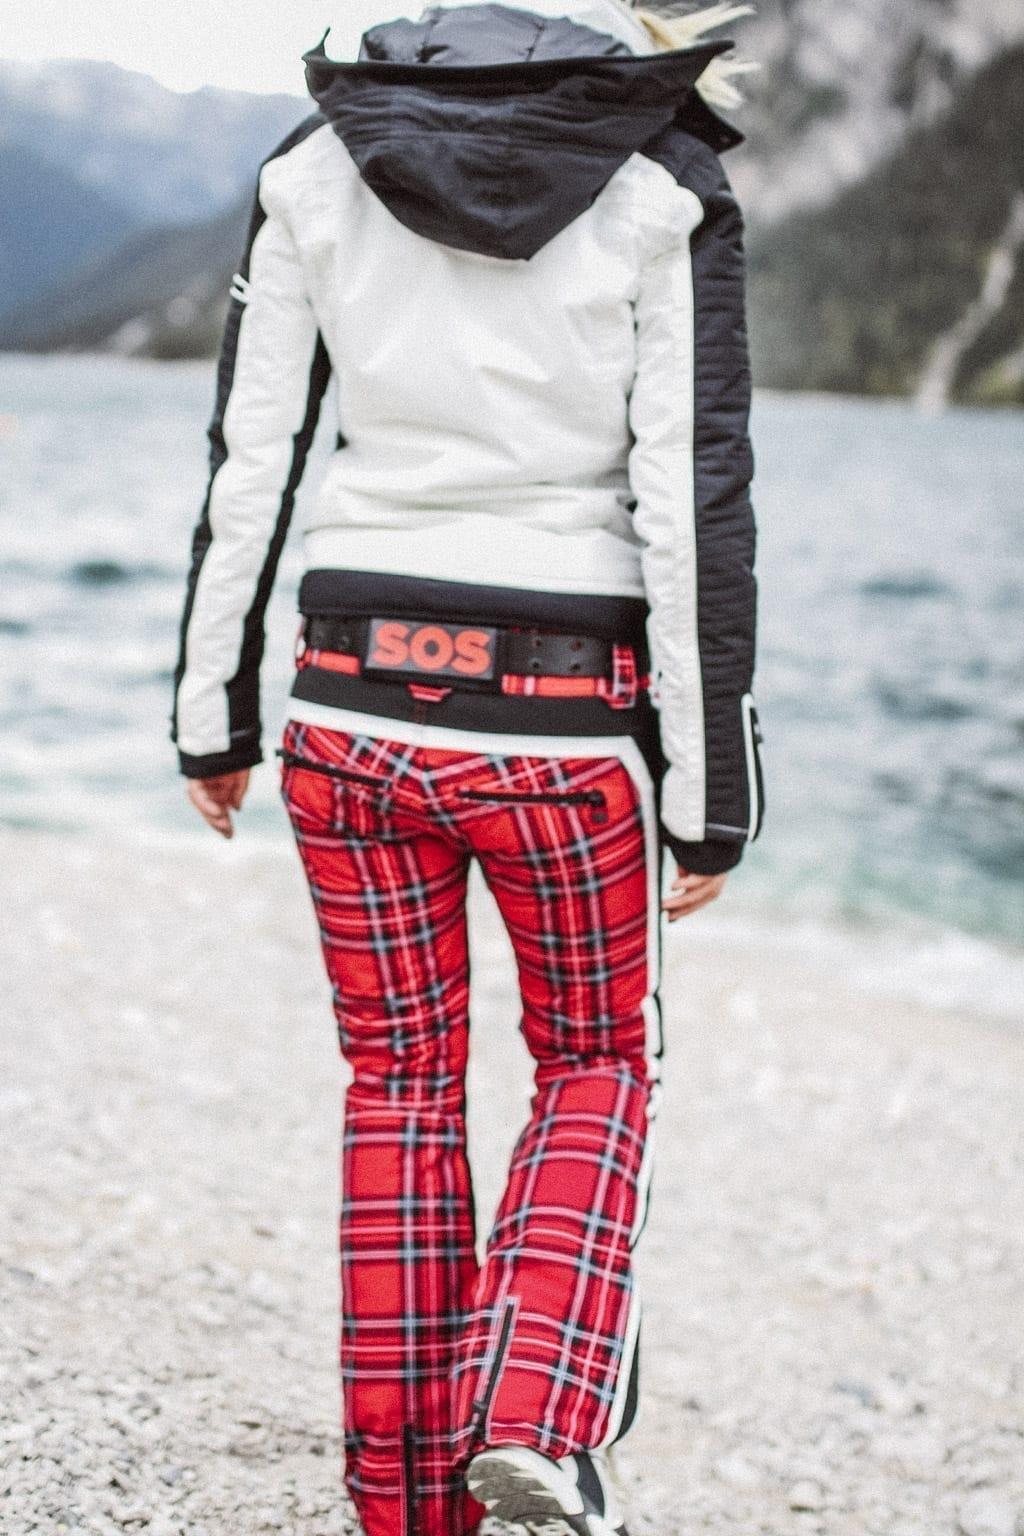 ck-constantlyk-com-sos-skiwear-copenhagen-1305